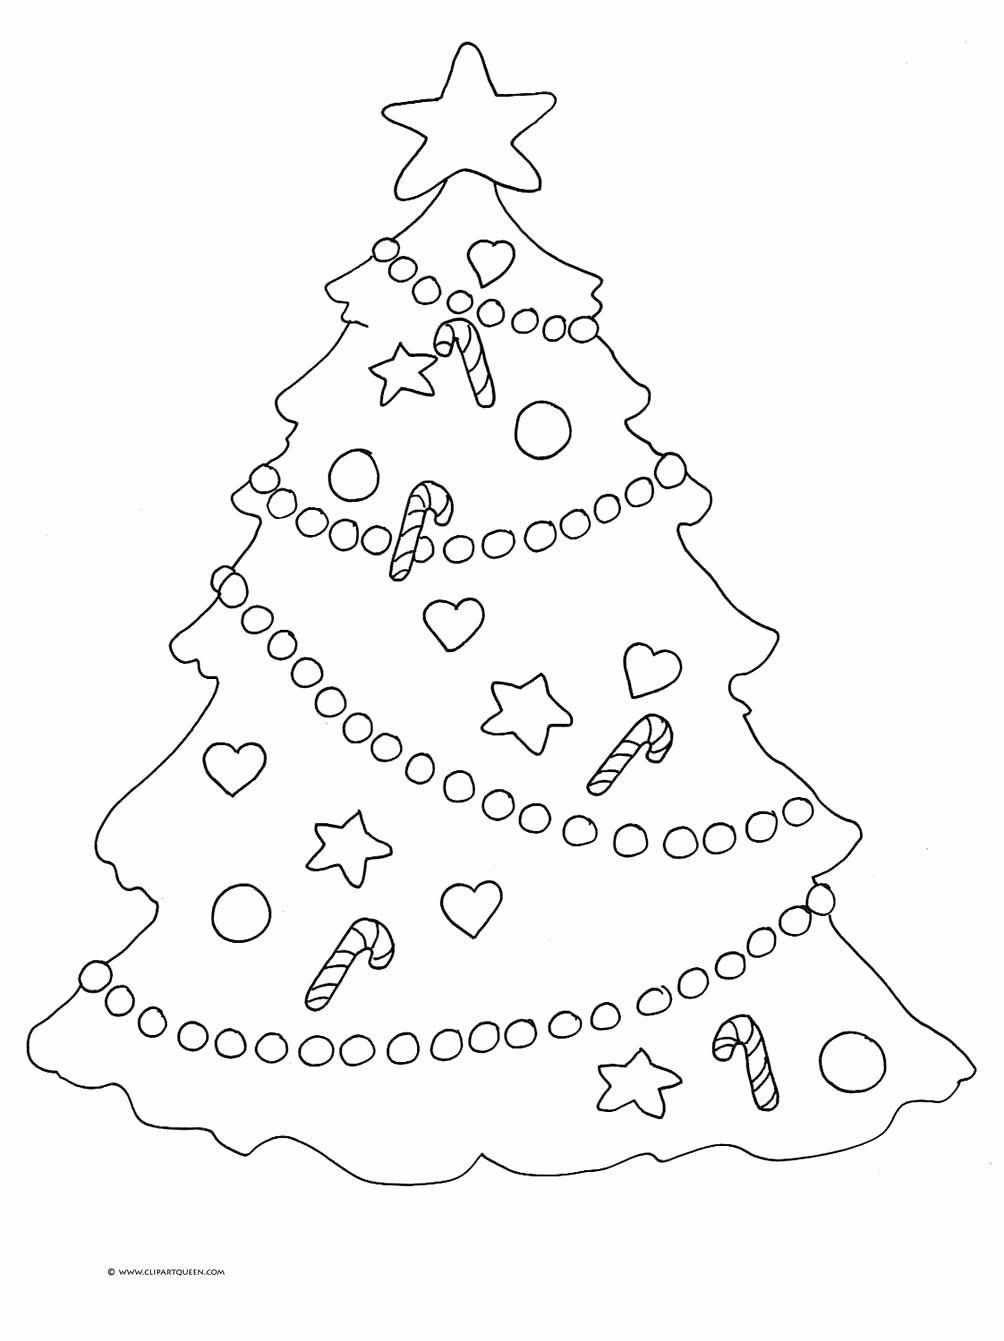 Christmas Tree Coloring Book Awesome Christmas Coloring Pages Christmas Coloring Pages Christmas Tree Coloring Page Kids Christmas Coloring Pages